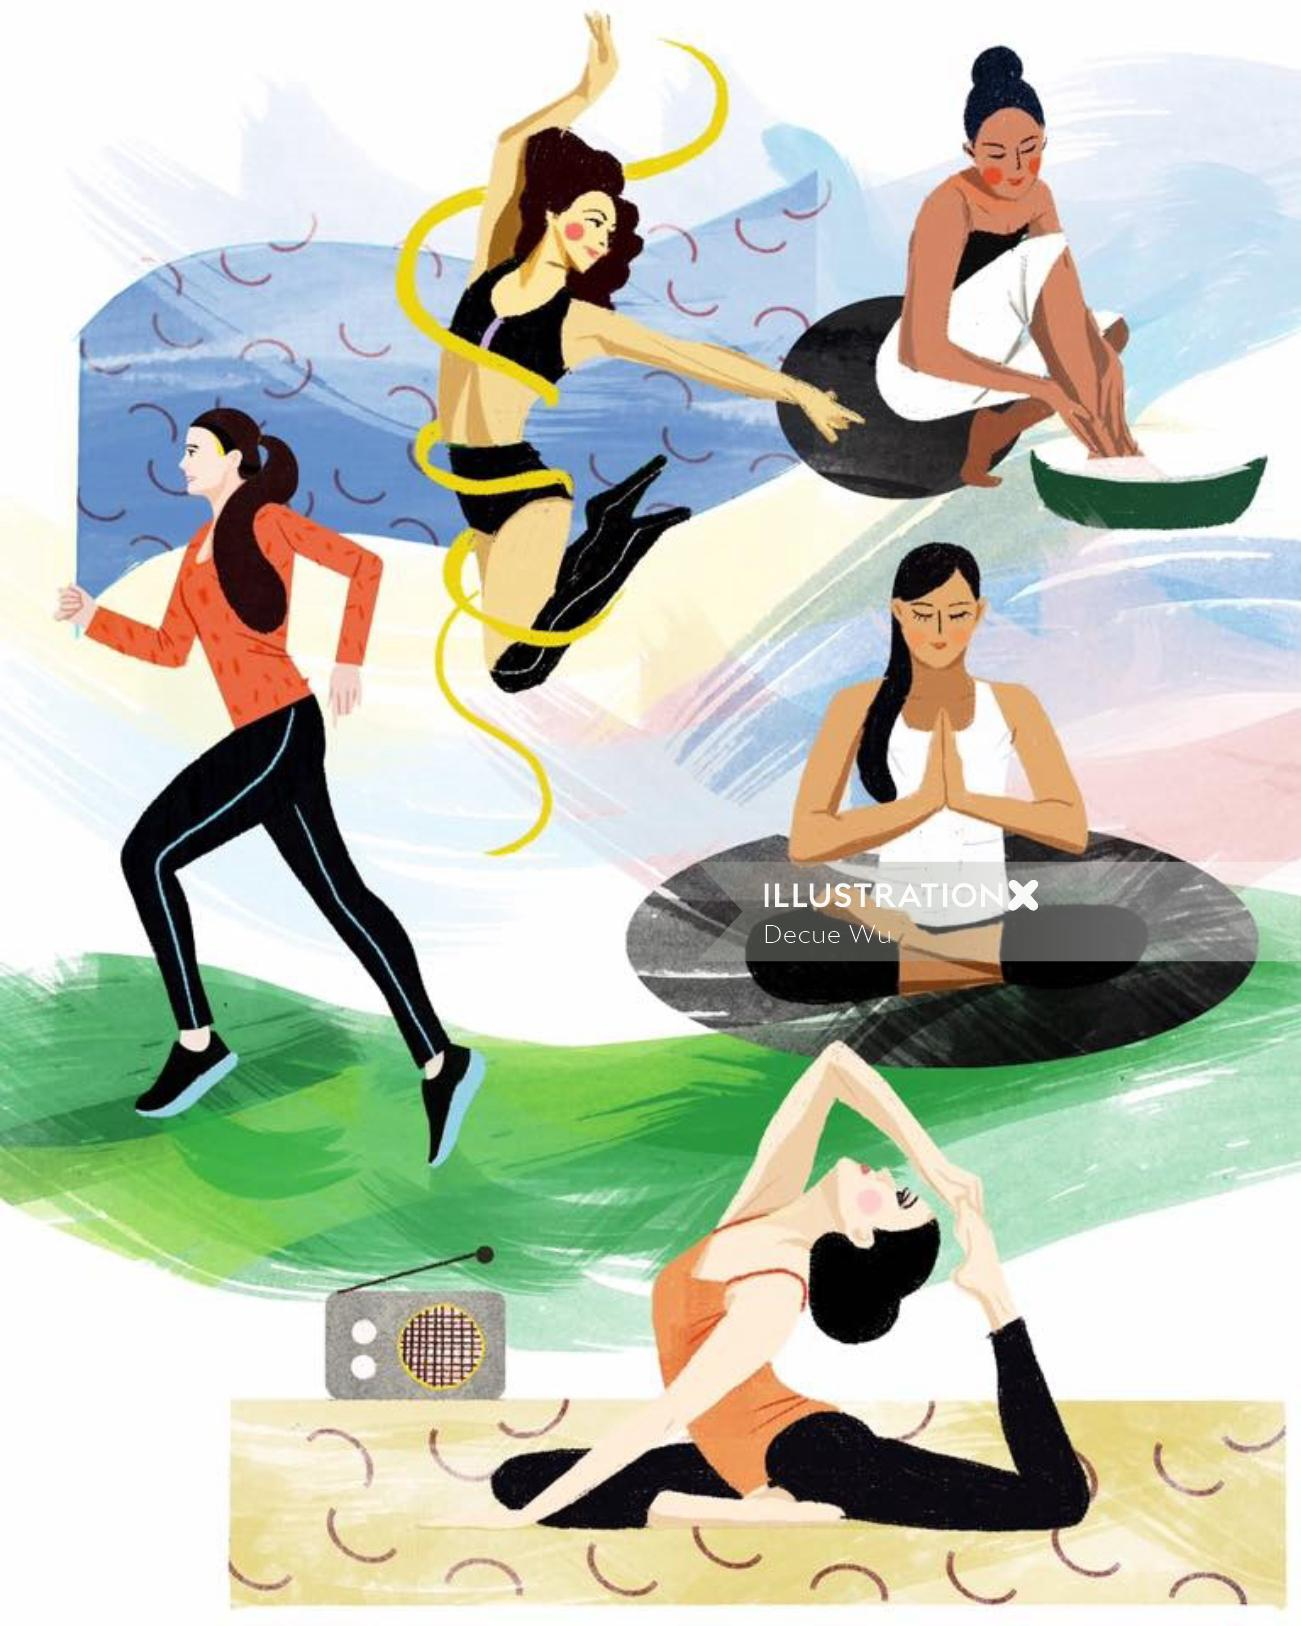 Lifestyle illustration of women fitness